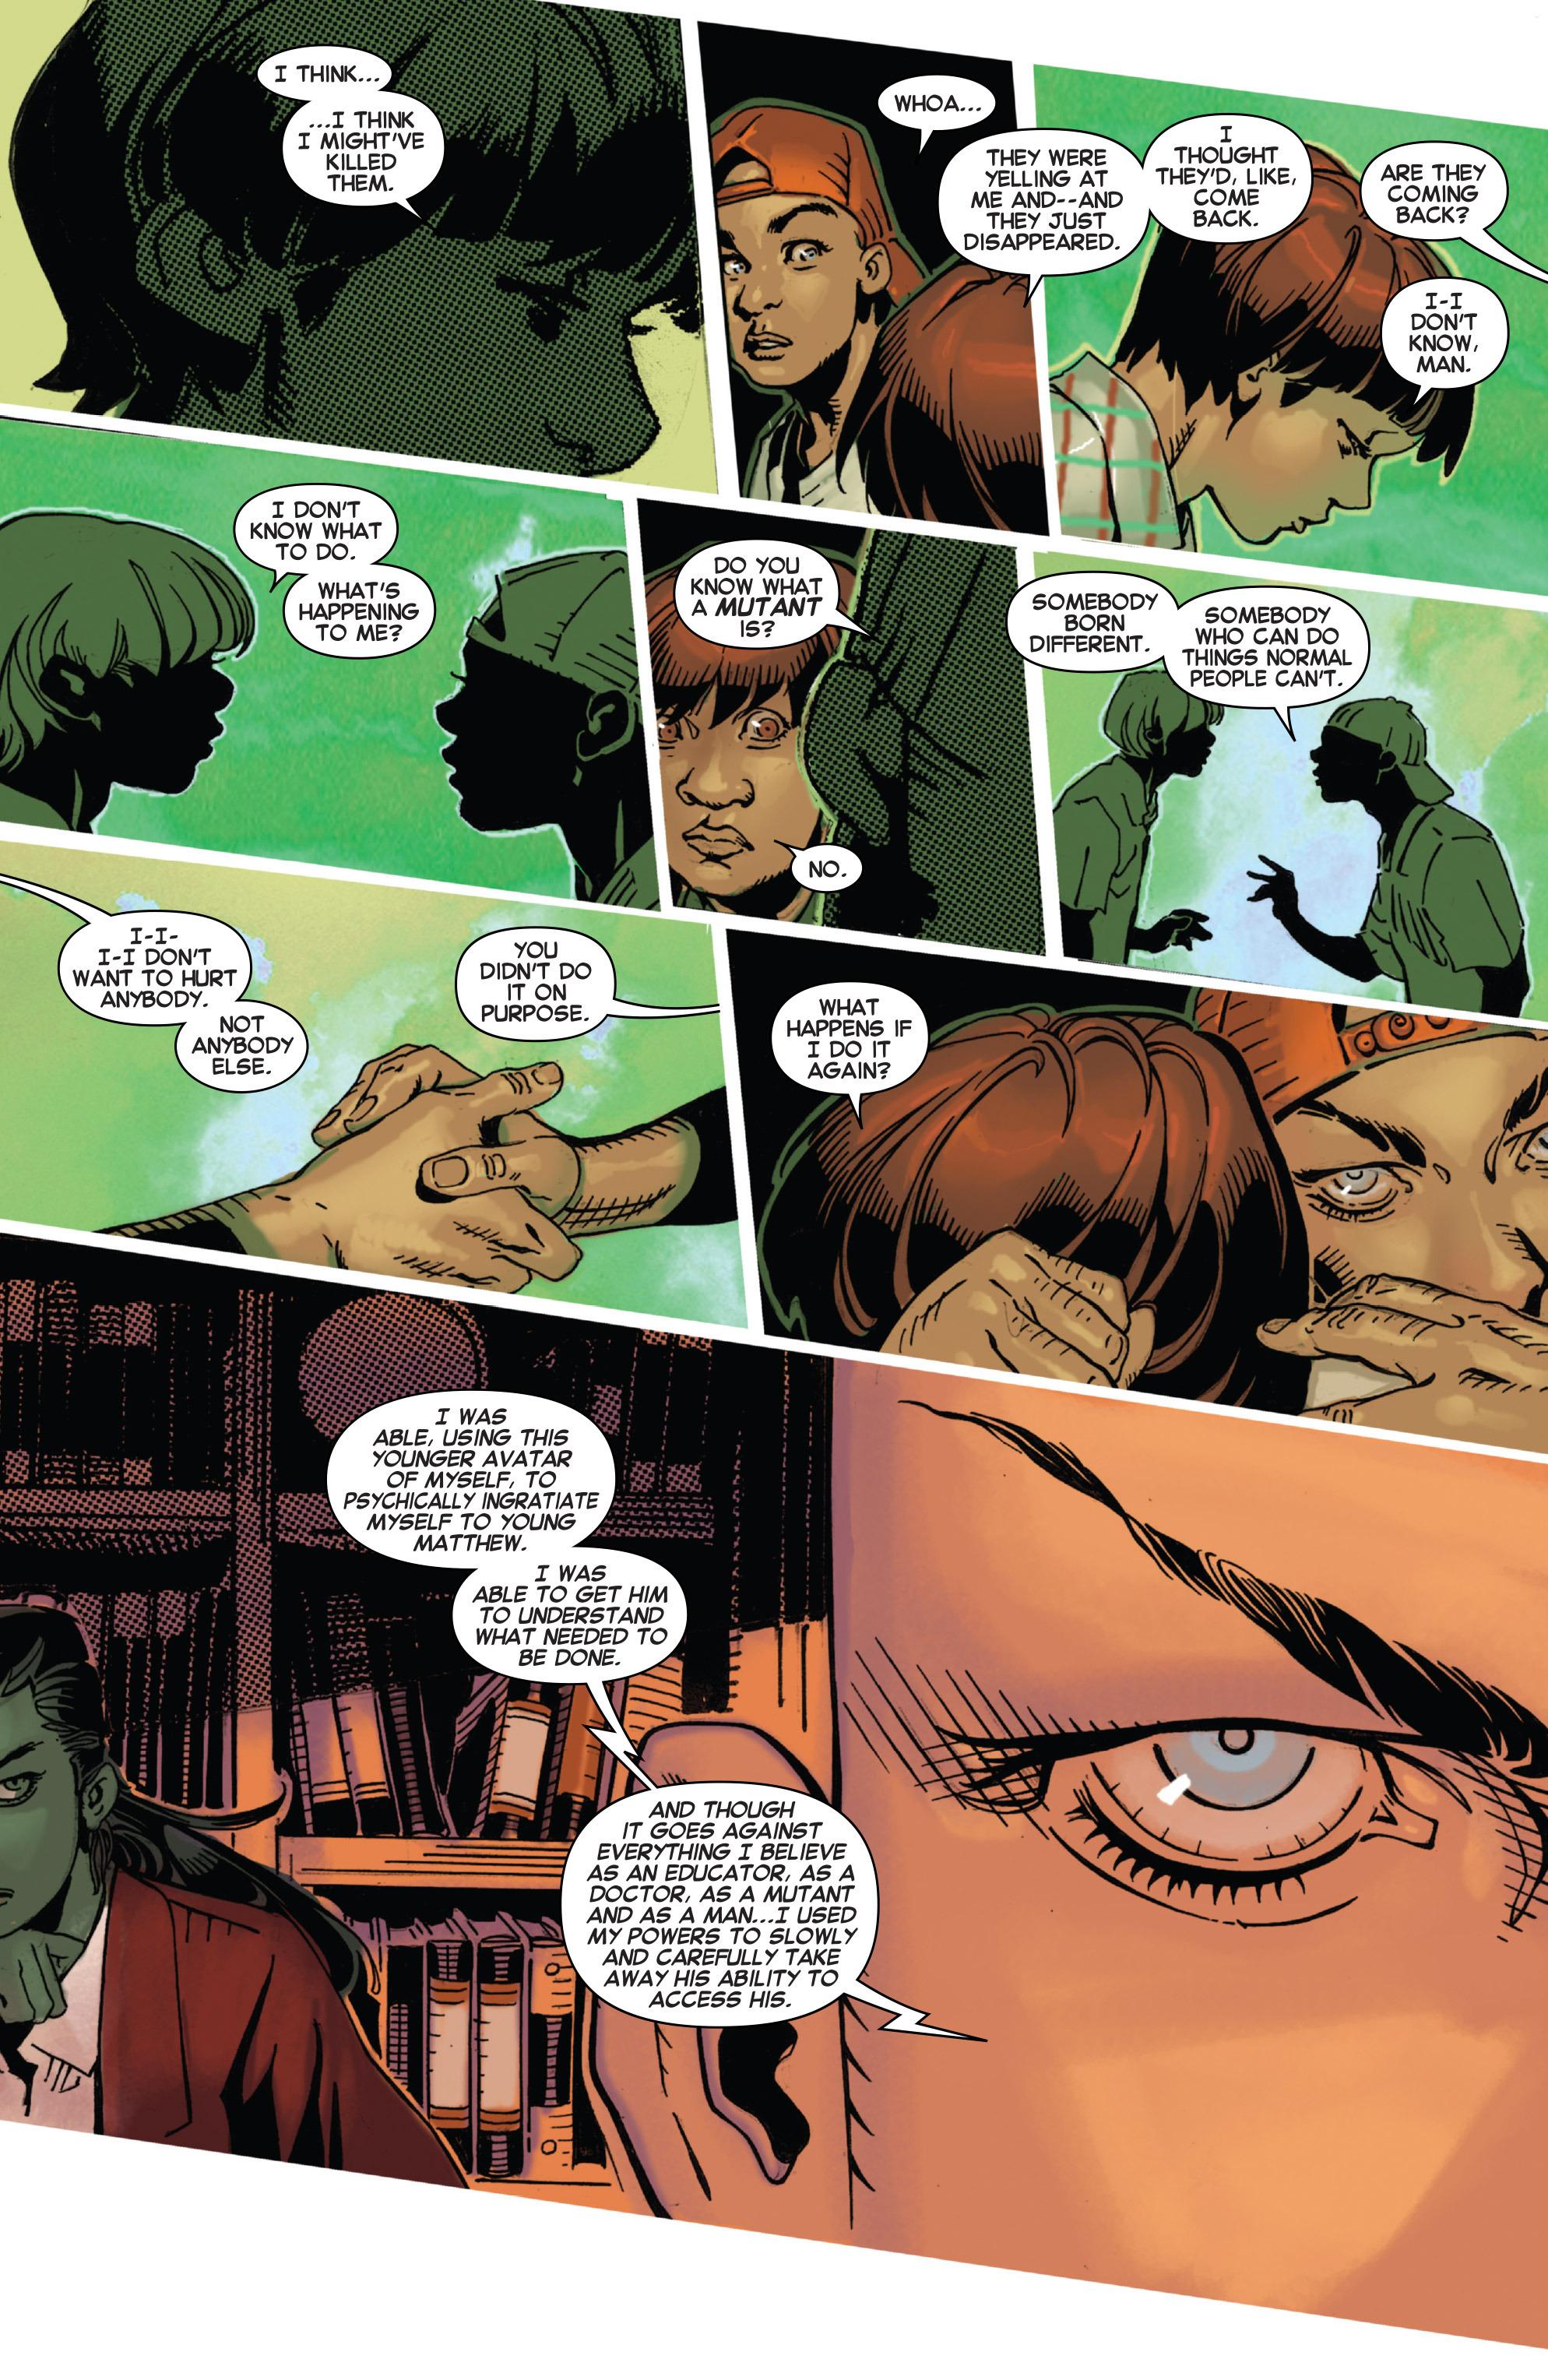 Read online Uncanny X-Men (2013) comic -  Issue # _TPB 4 - vs. S.H.I.E.L.D - 132